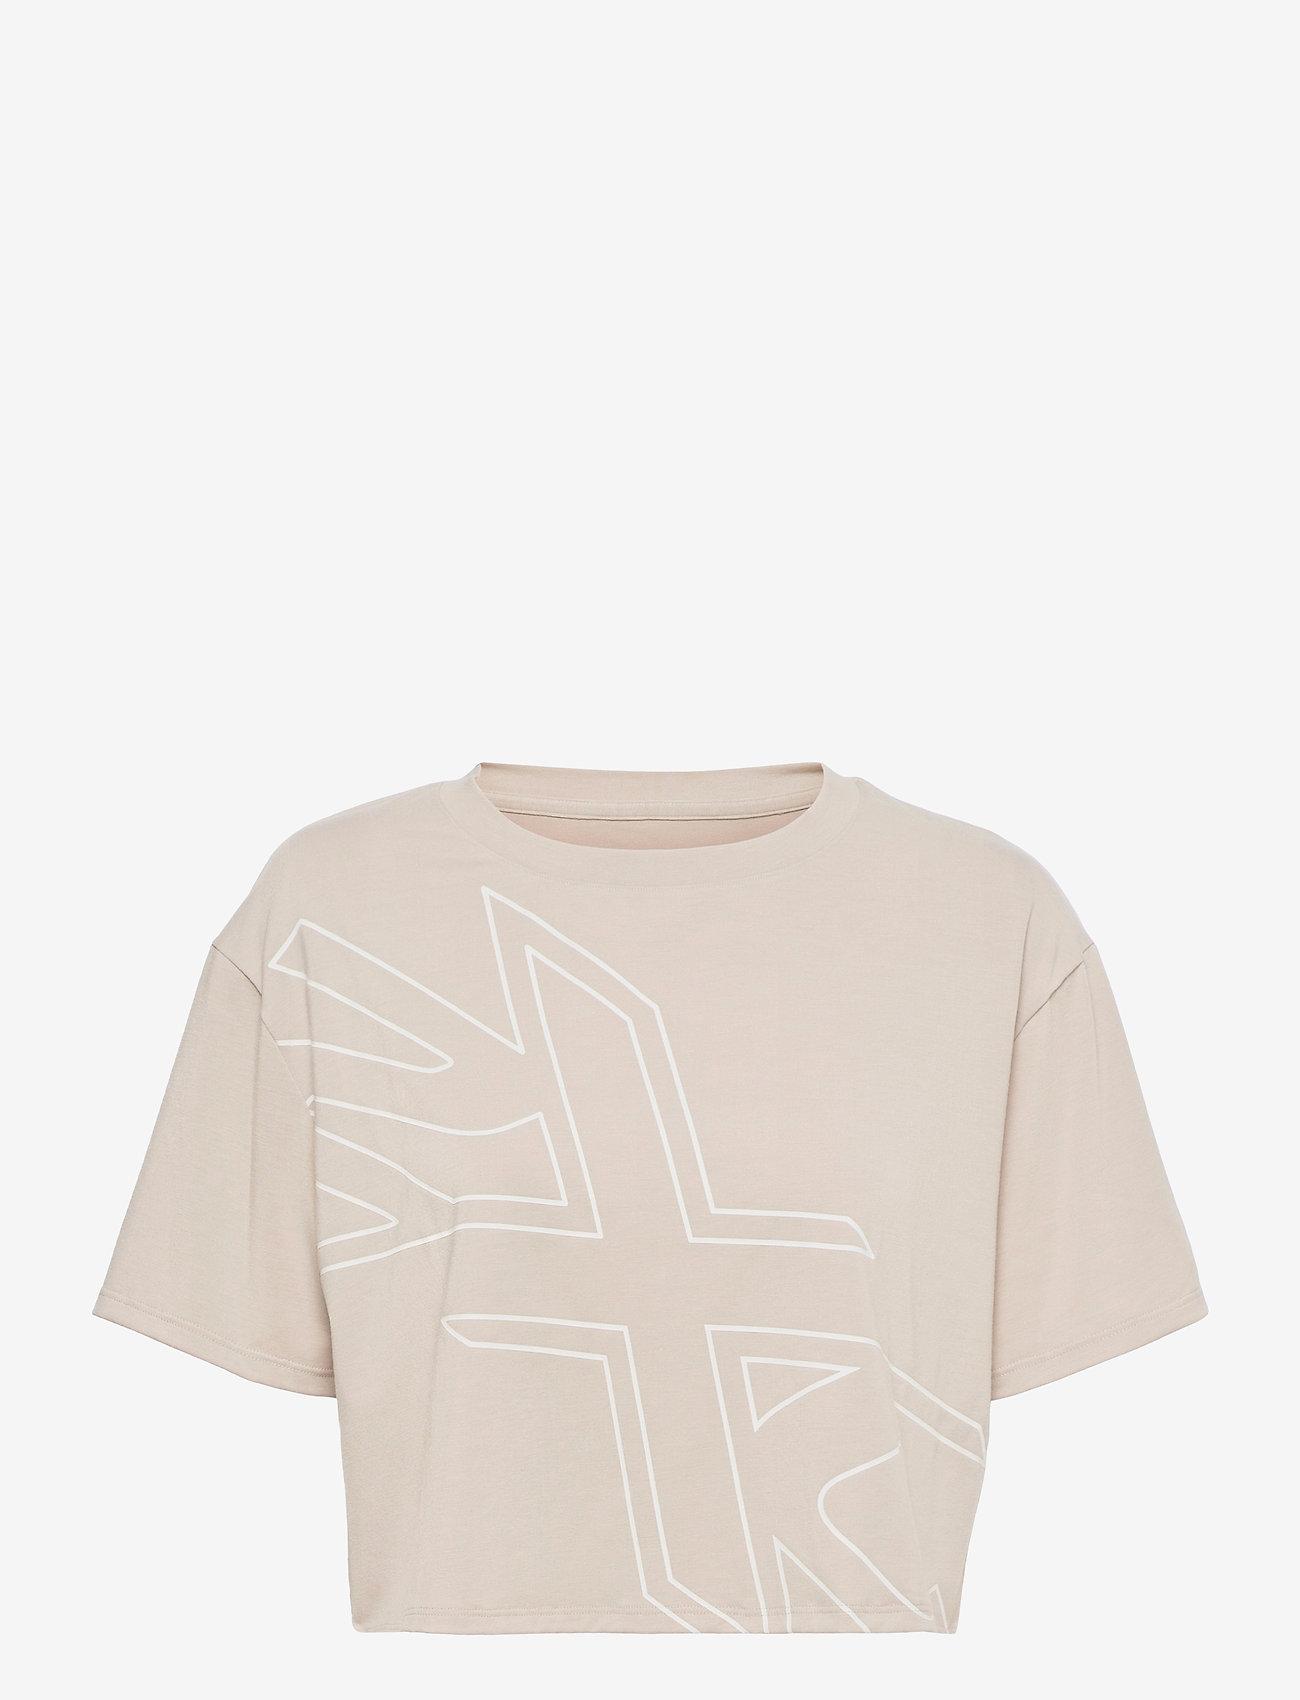 2XU - FORM CROP TEE - navel shirts - oatmeal/white - 0